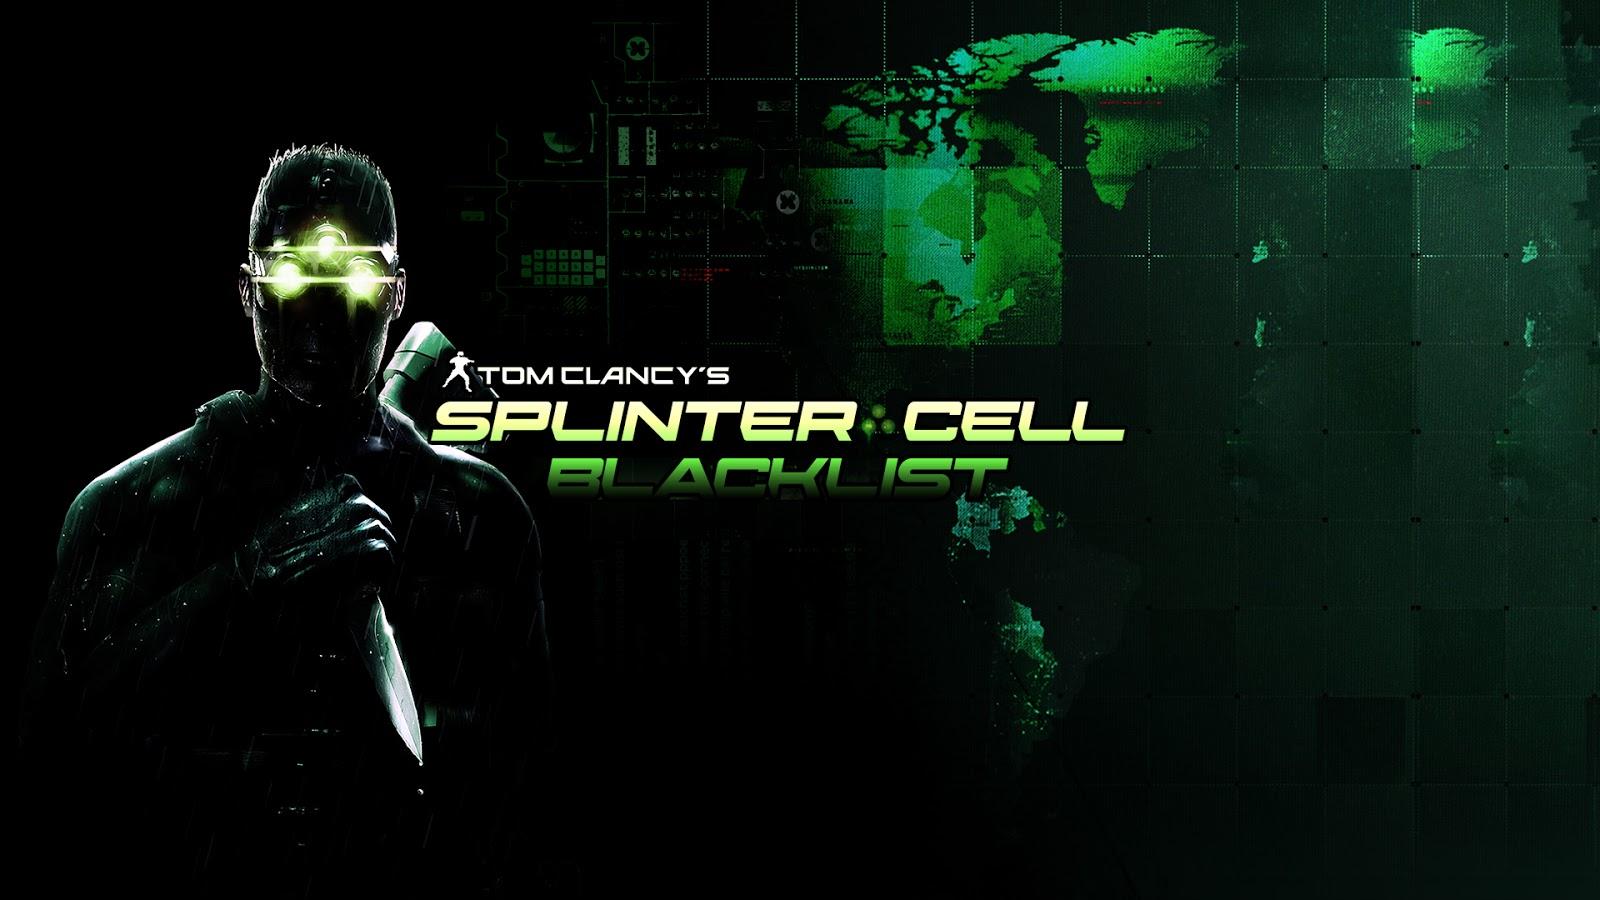 Splinter Cell Blacklist Wallpaper HD 1600x900